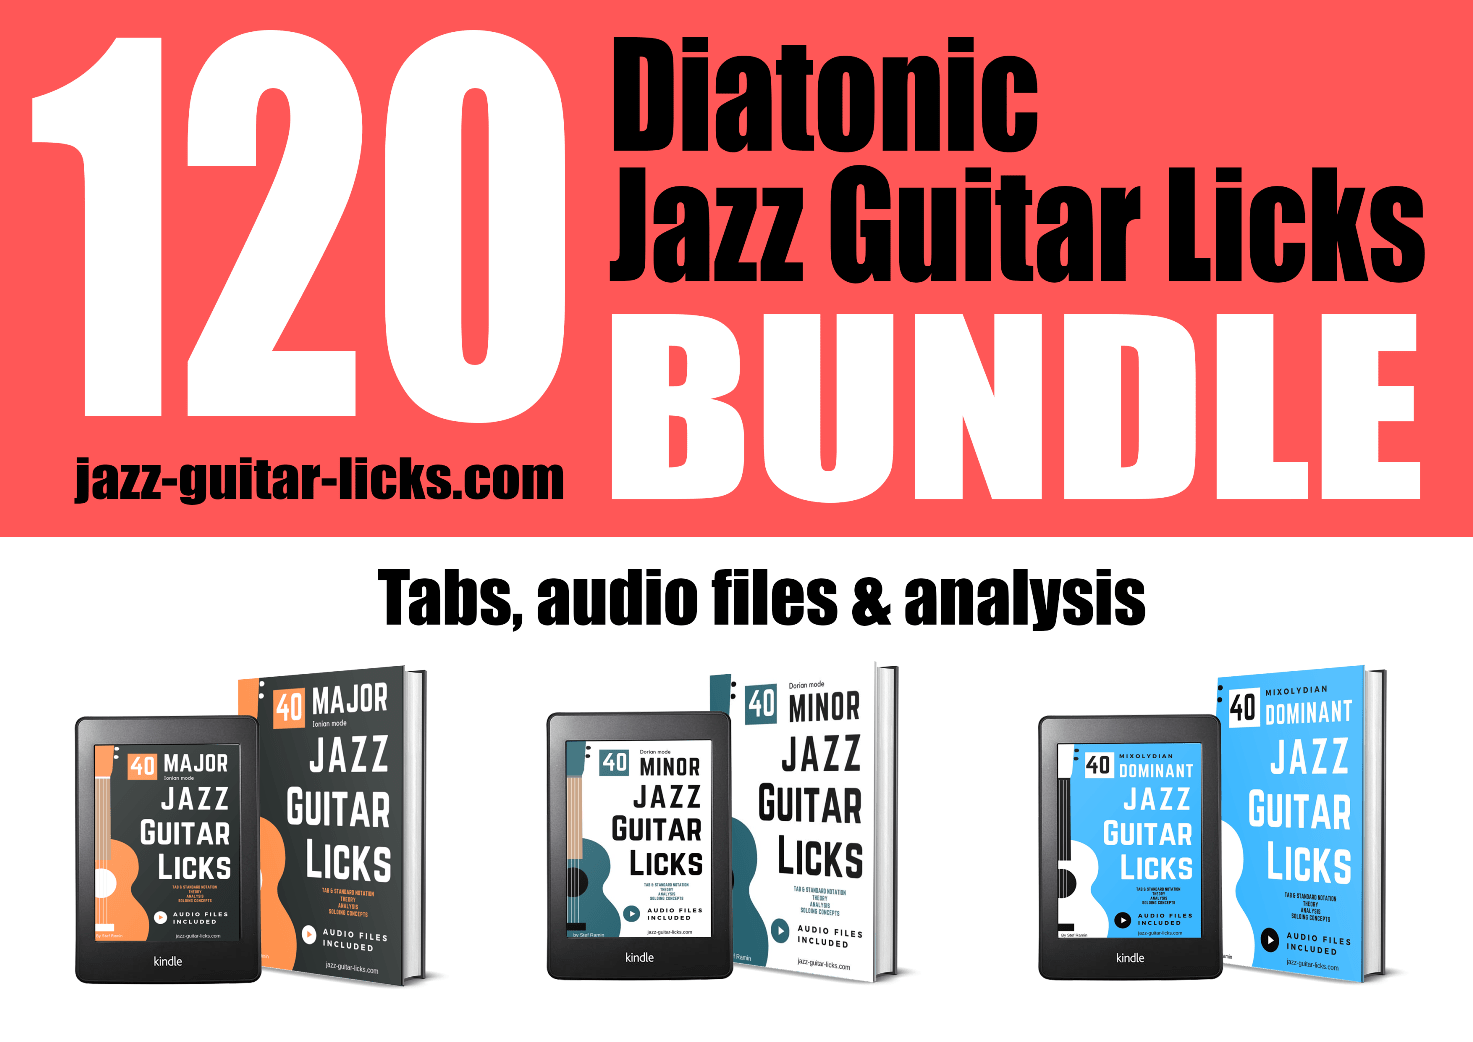 120 diatonic jazz guitar licks exercises lesson bundle package